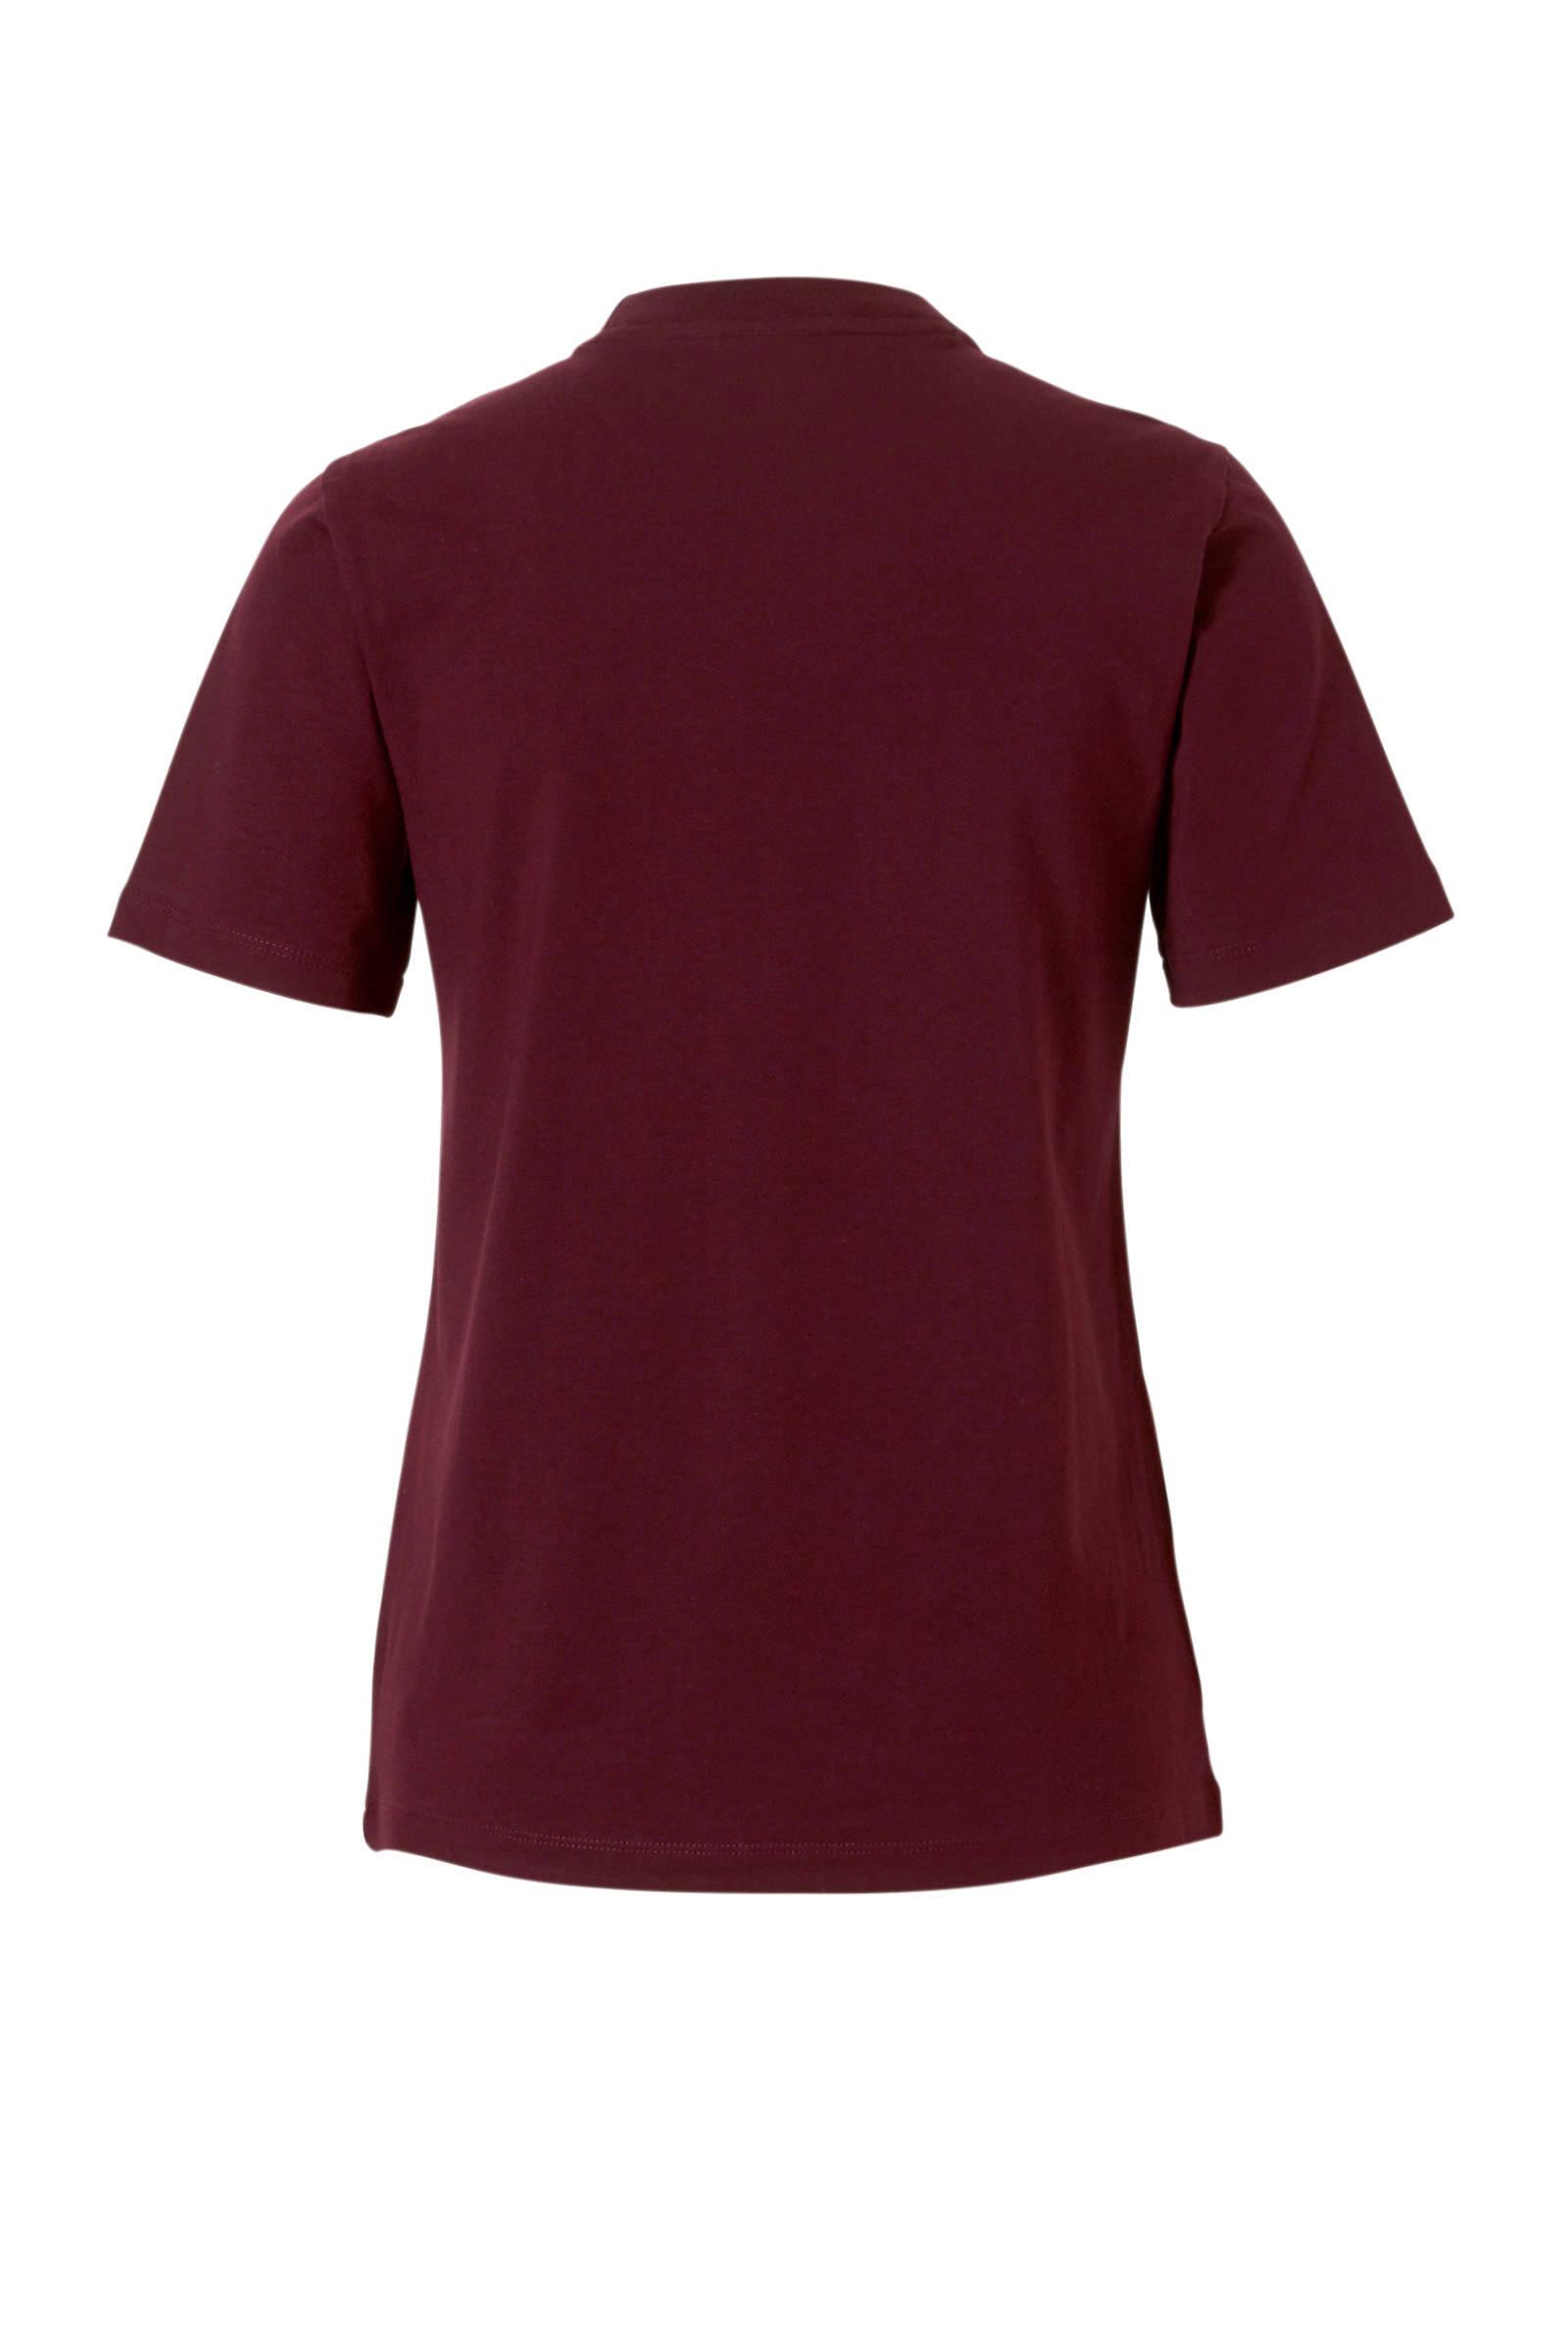 T-shirt bordeauxrood